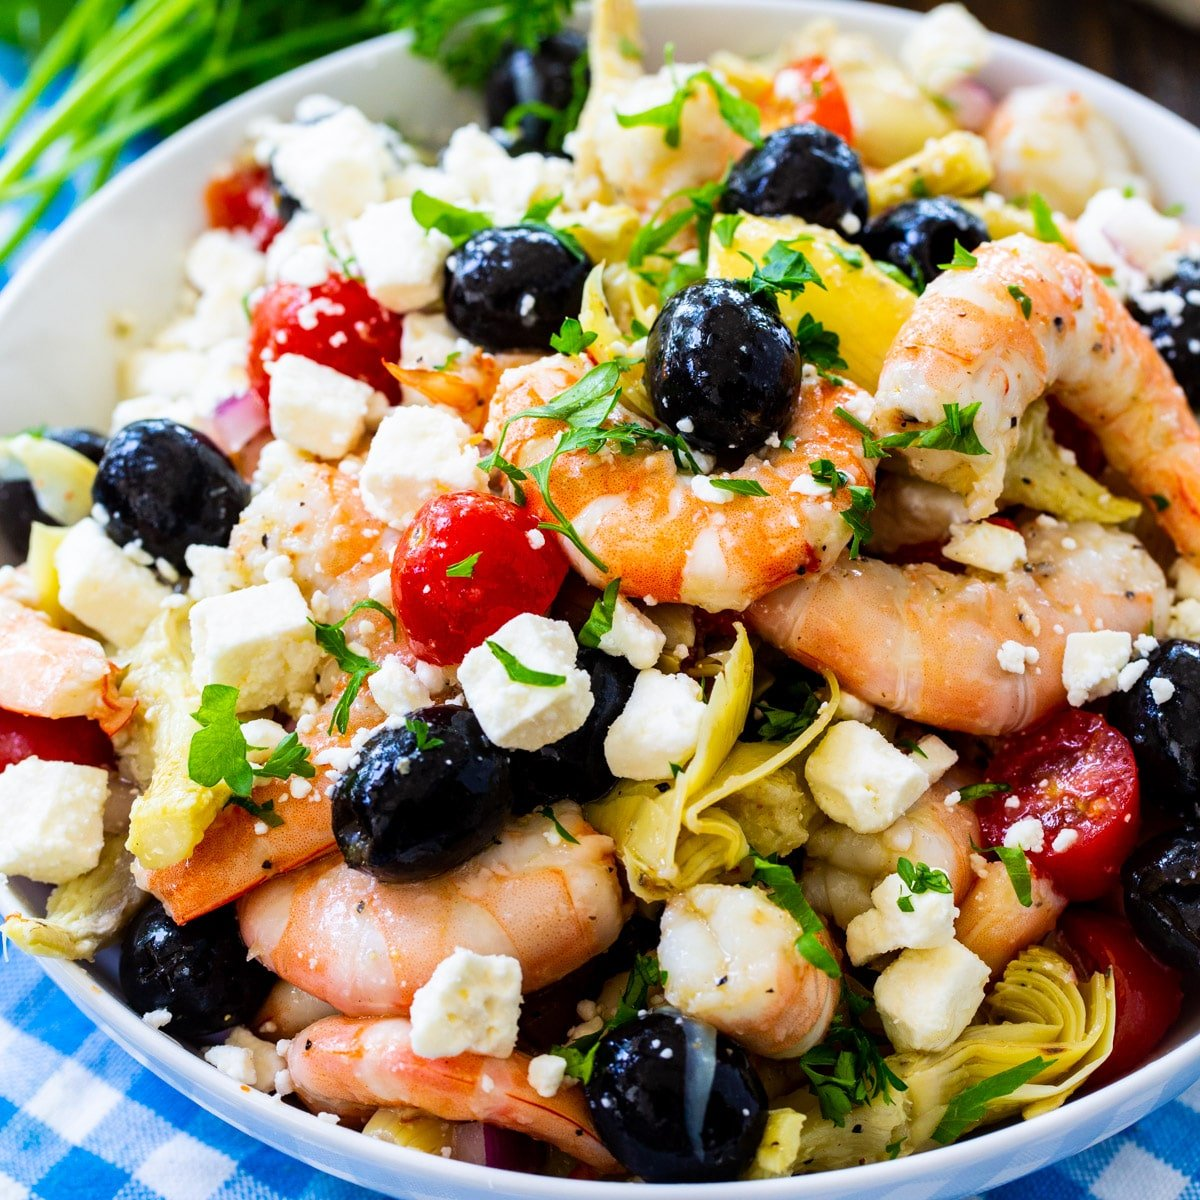 Italian Marinated Shrimp in a large bowl.